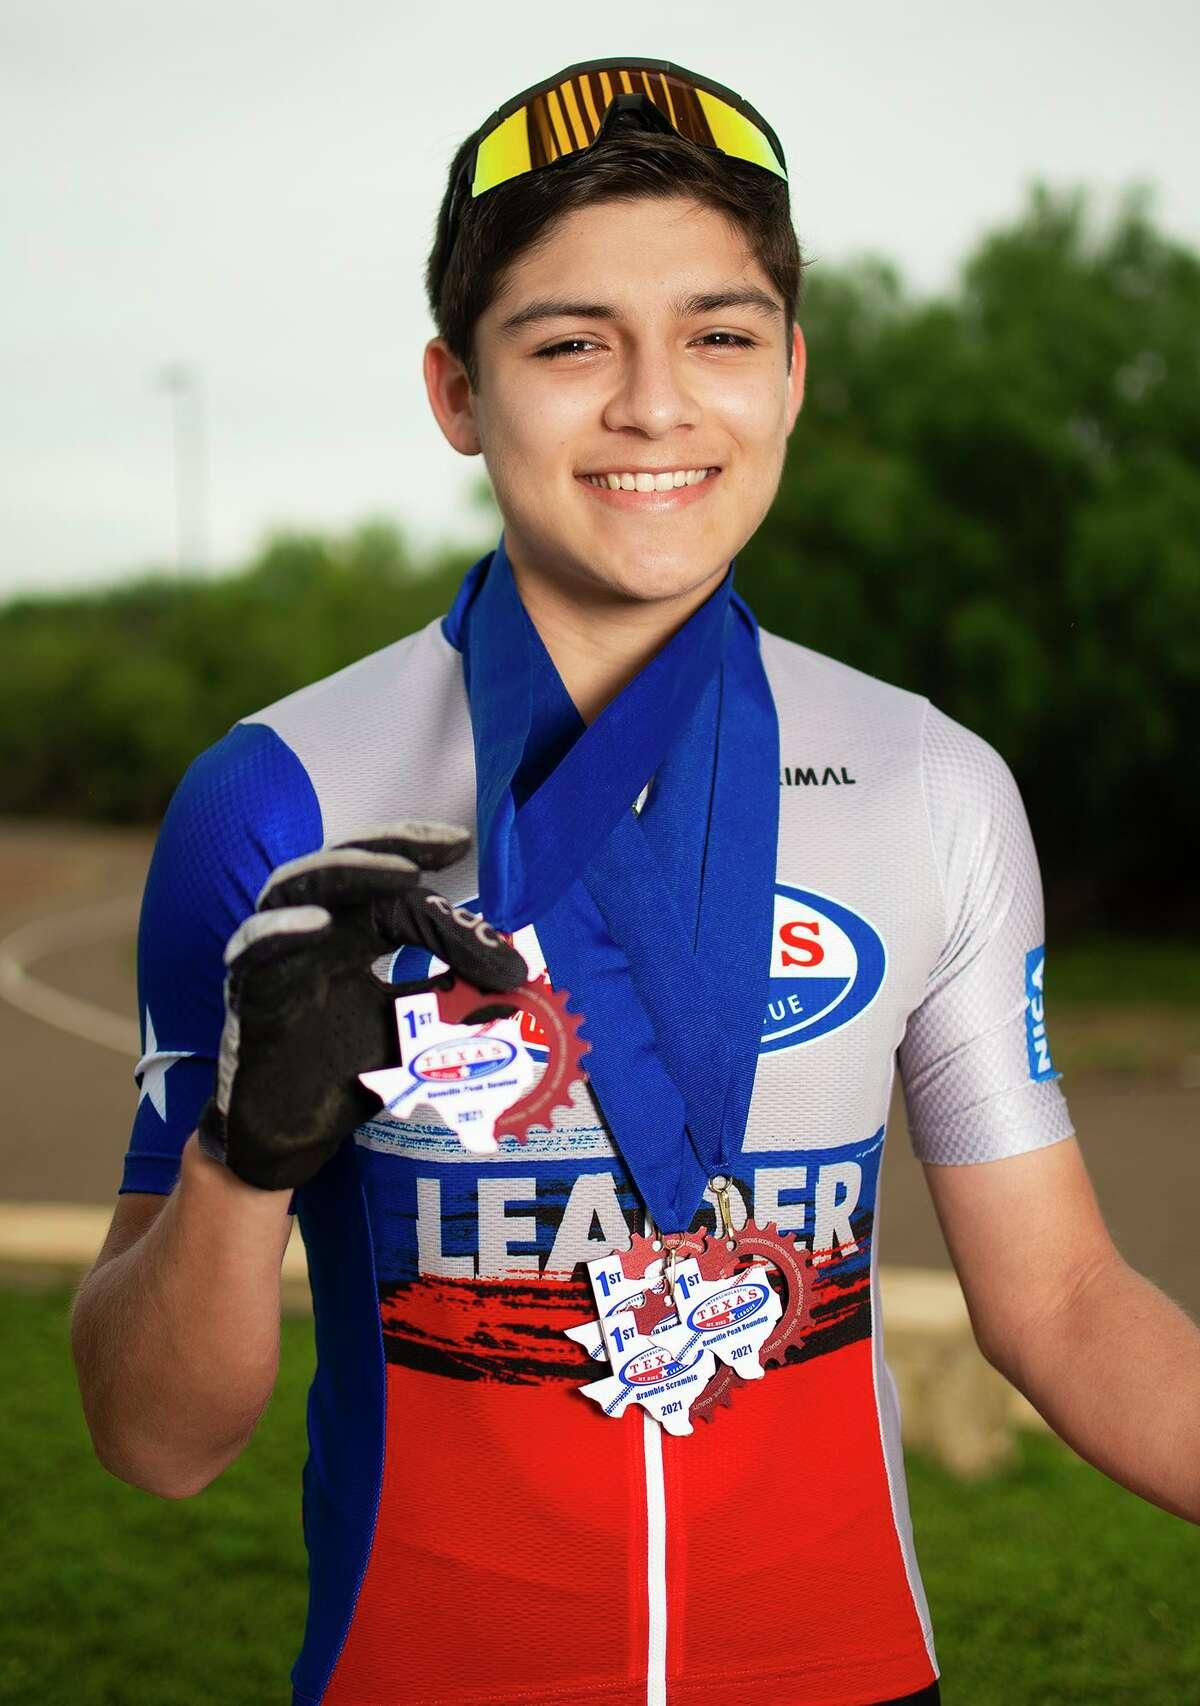 Alexander junior Daniel Musquiz has won four consecutive races this season.